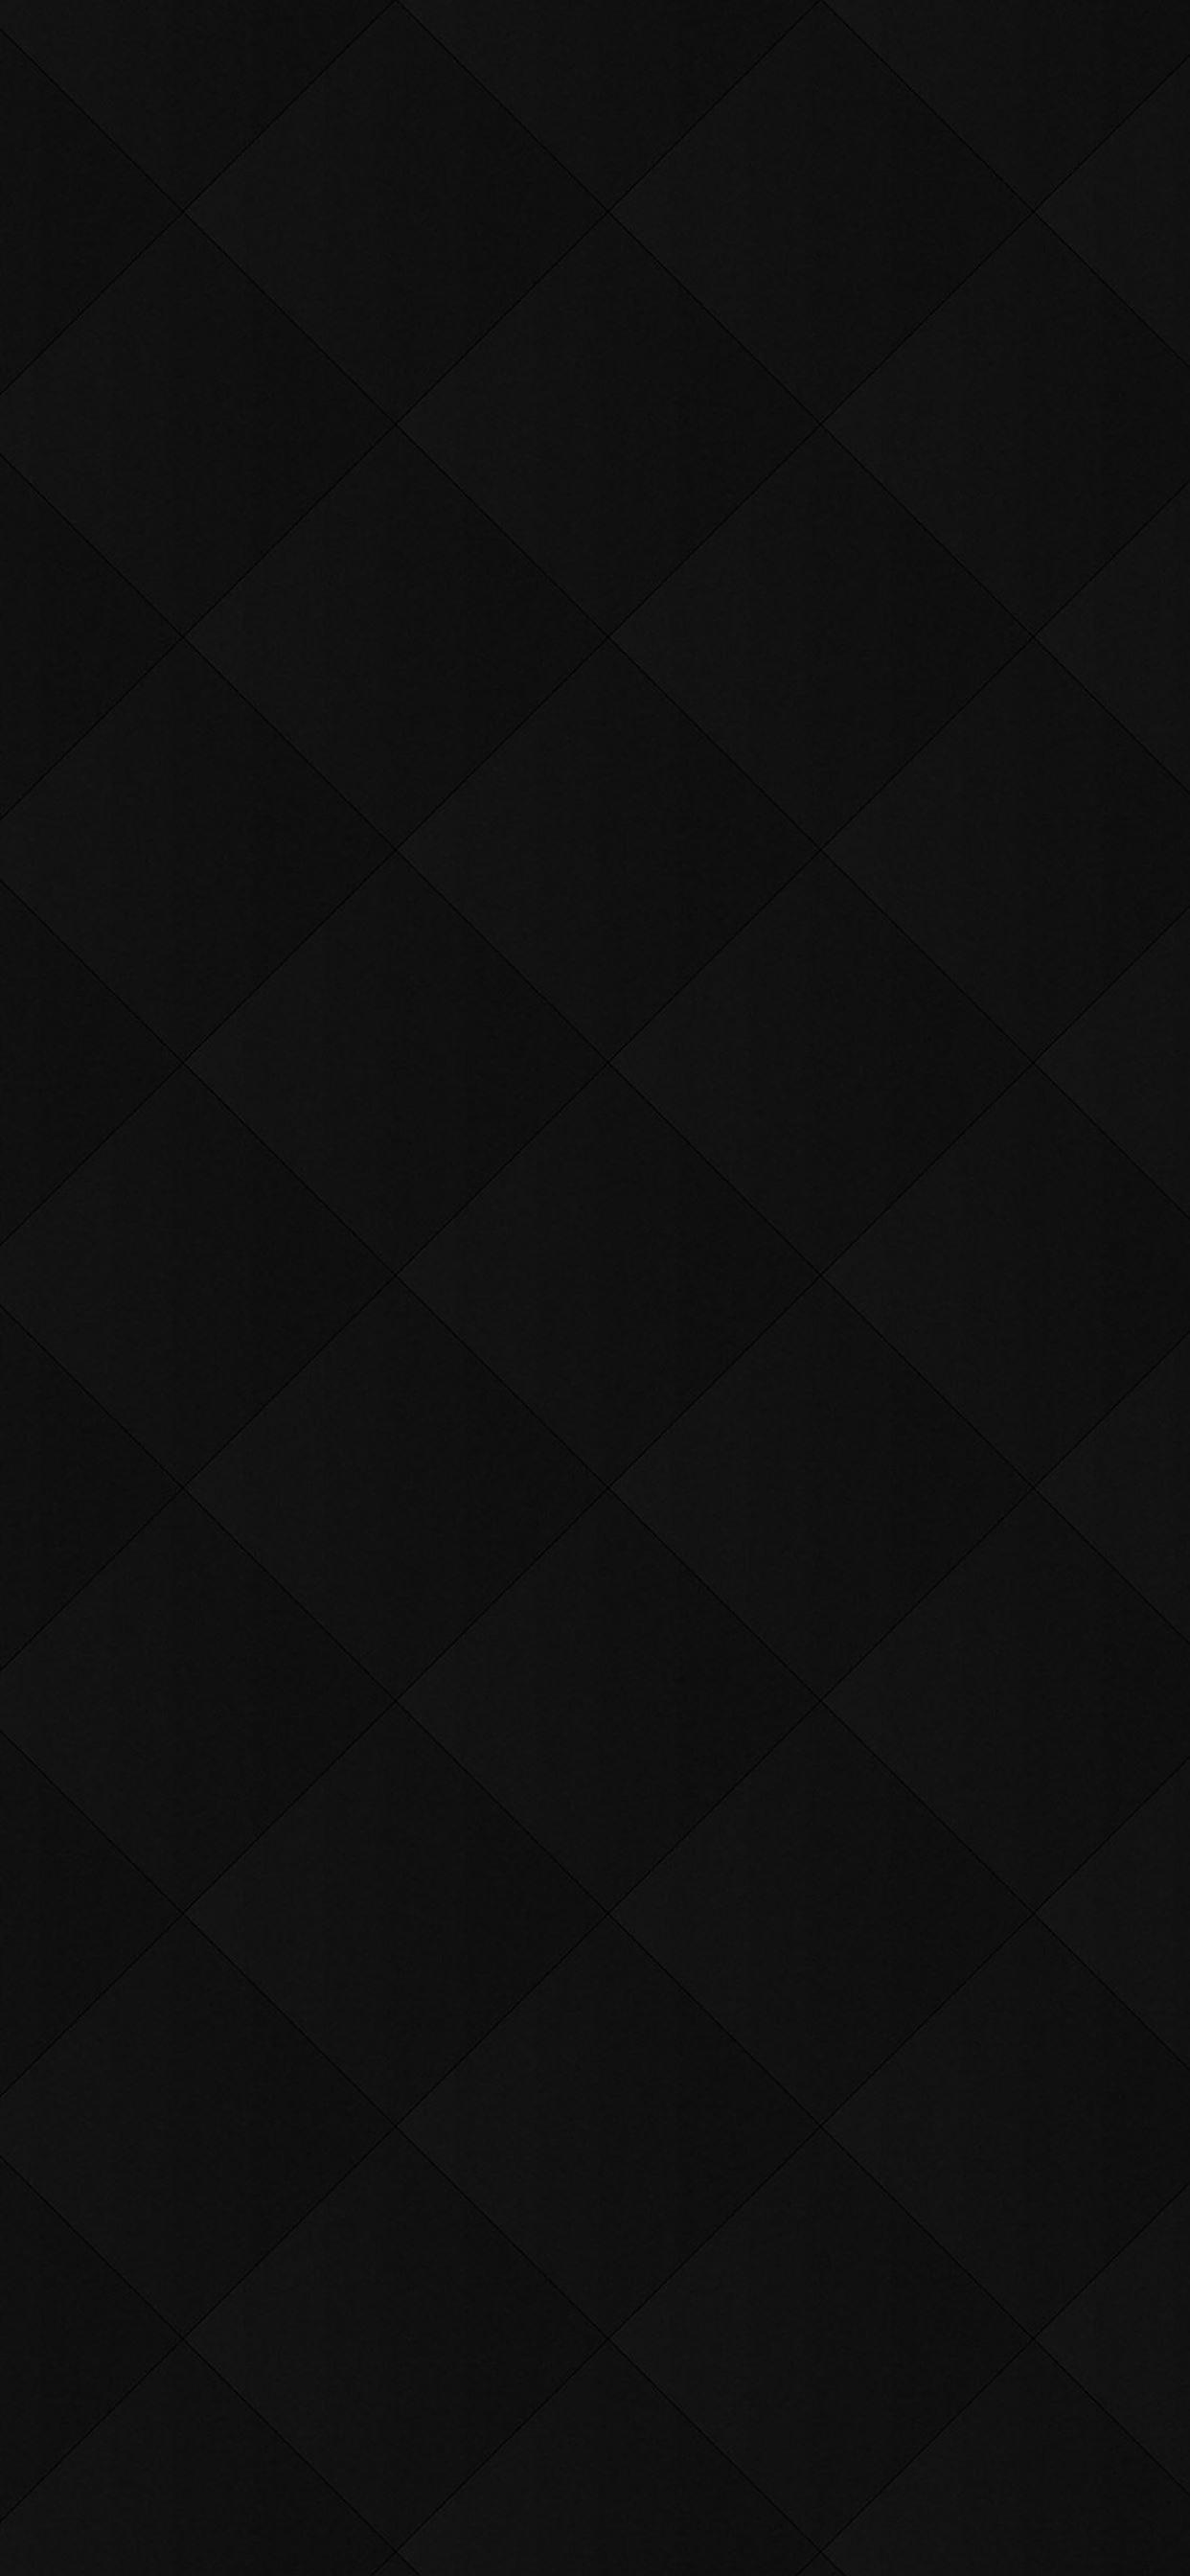 Gradient Squares Dark Pattern Iphone 11 Wallpapers Free Download